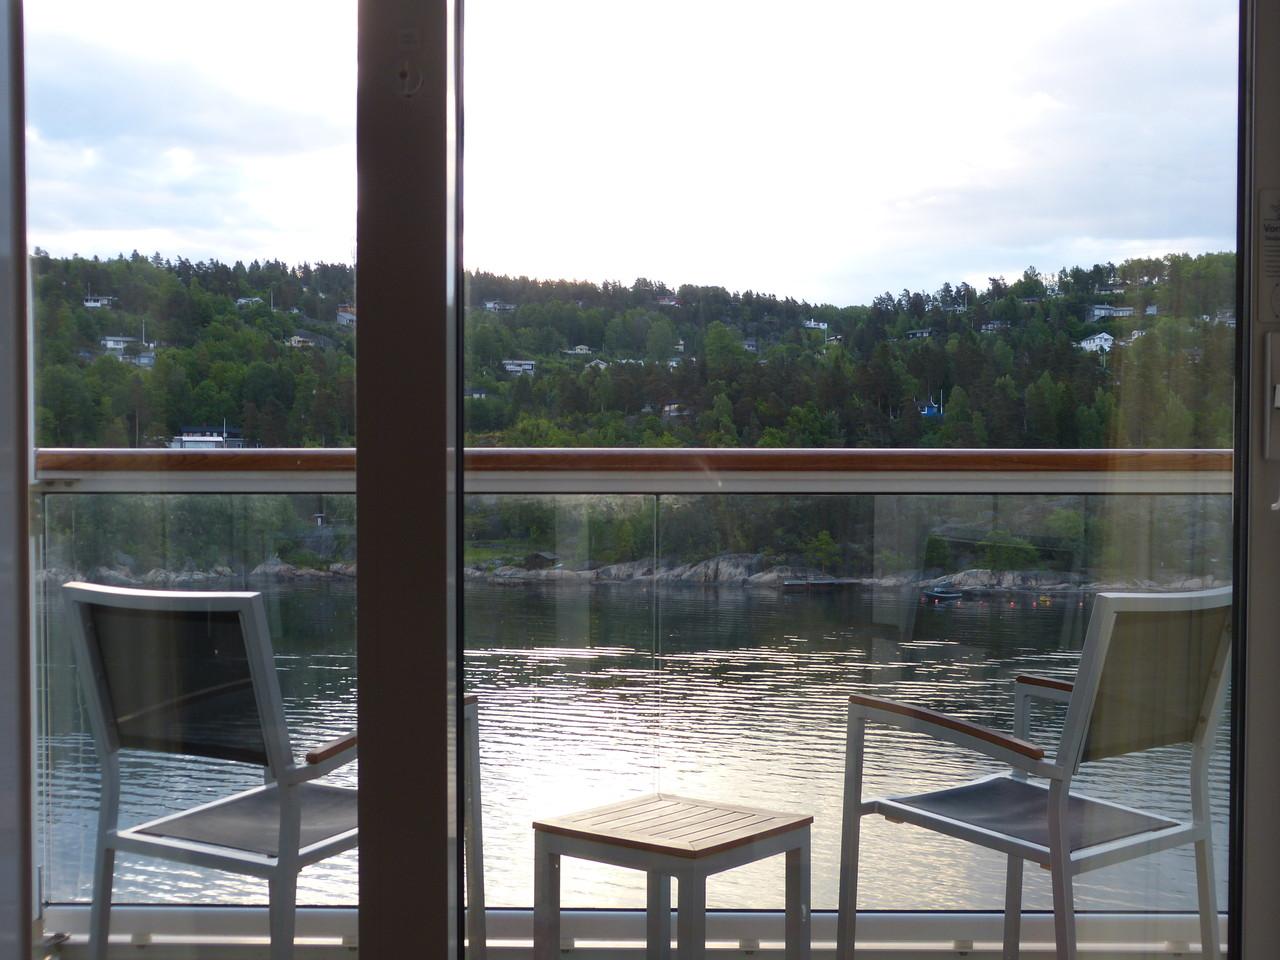 Morgens im Oslofjord